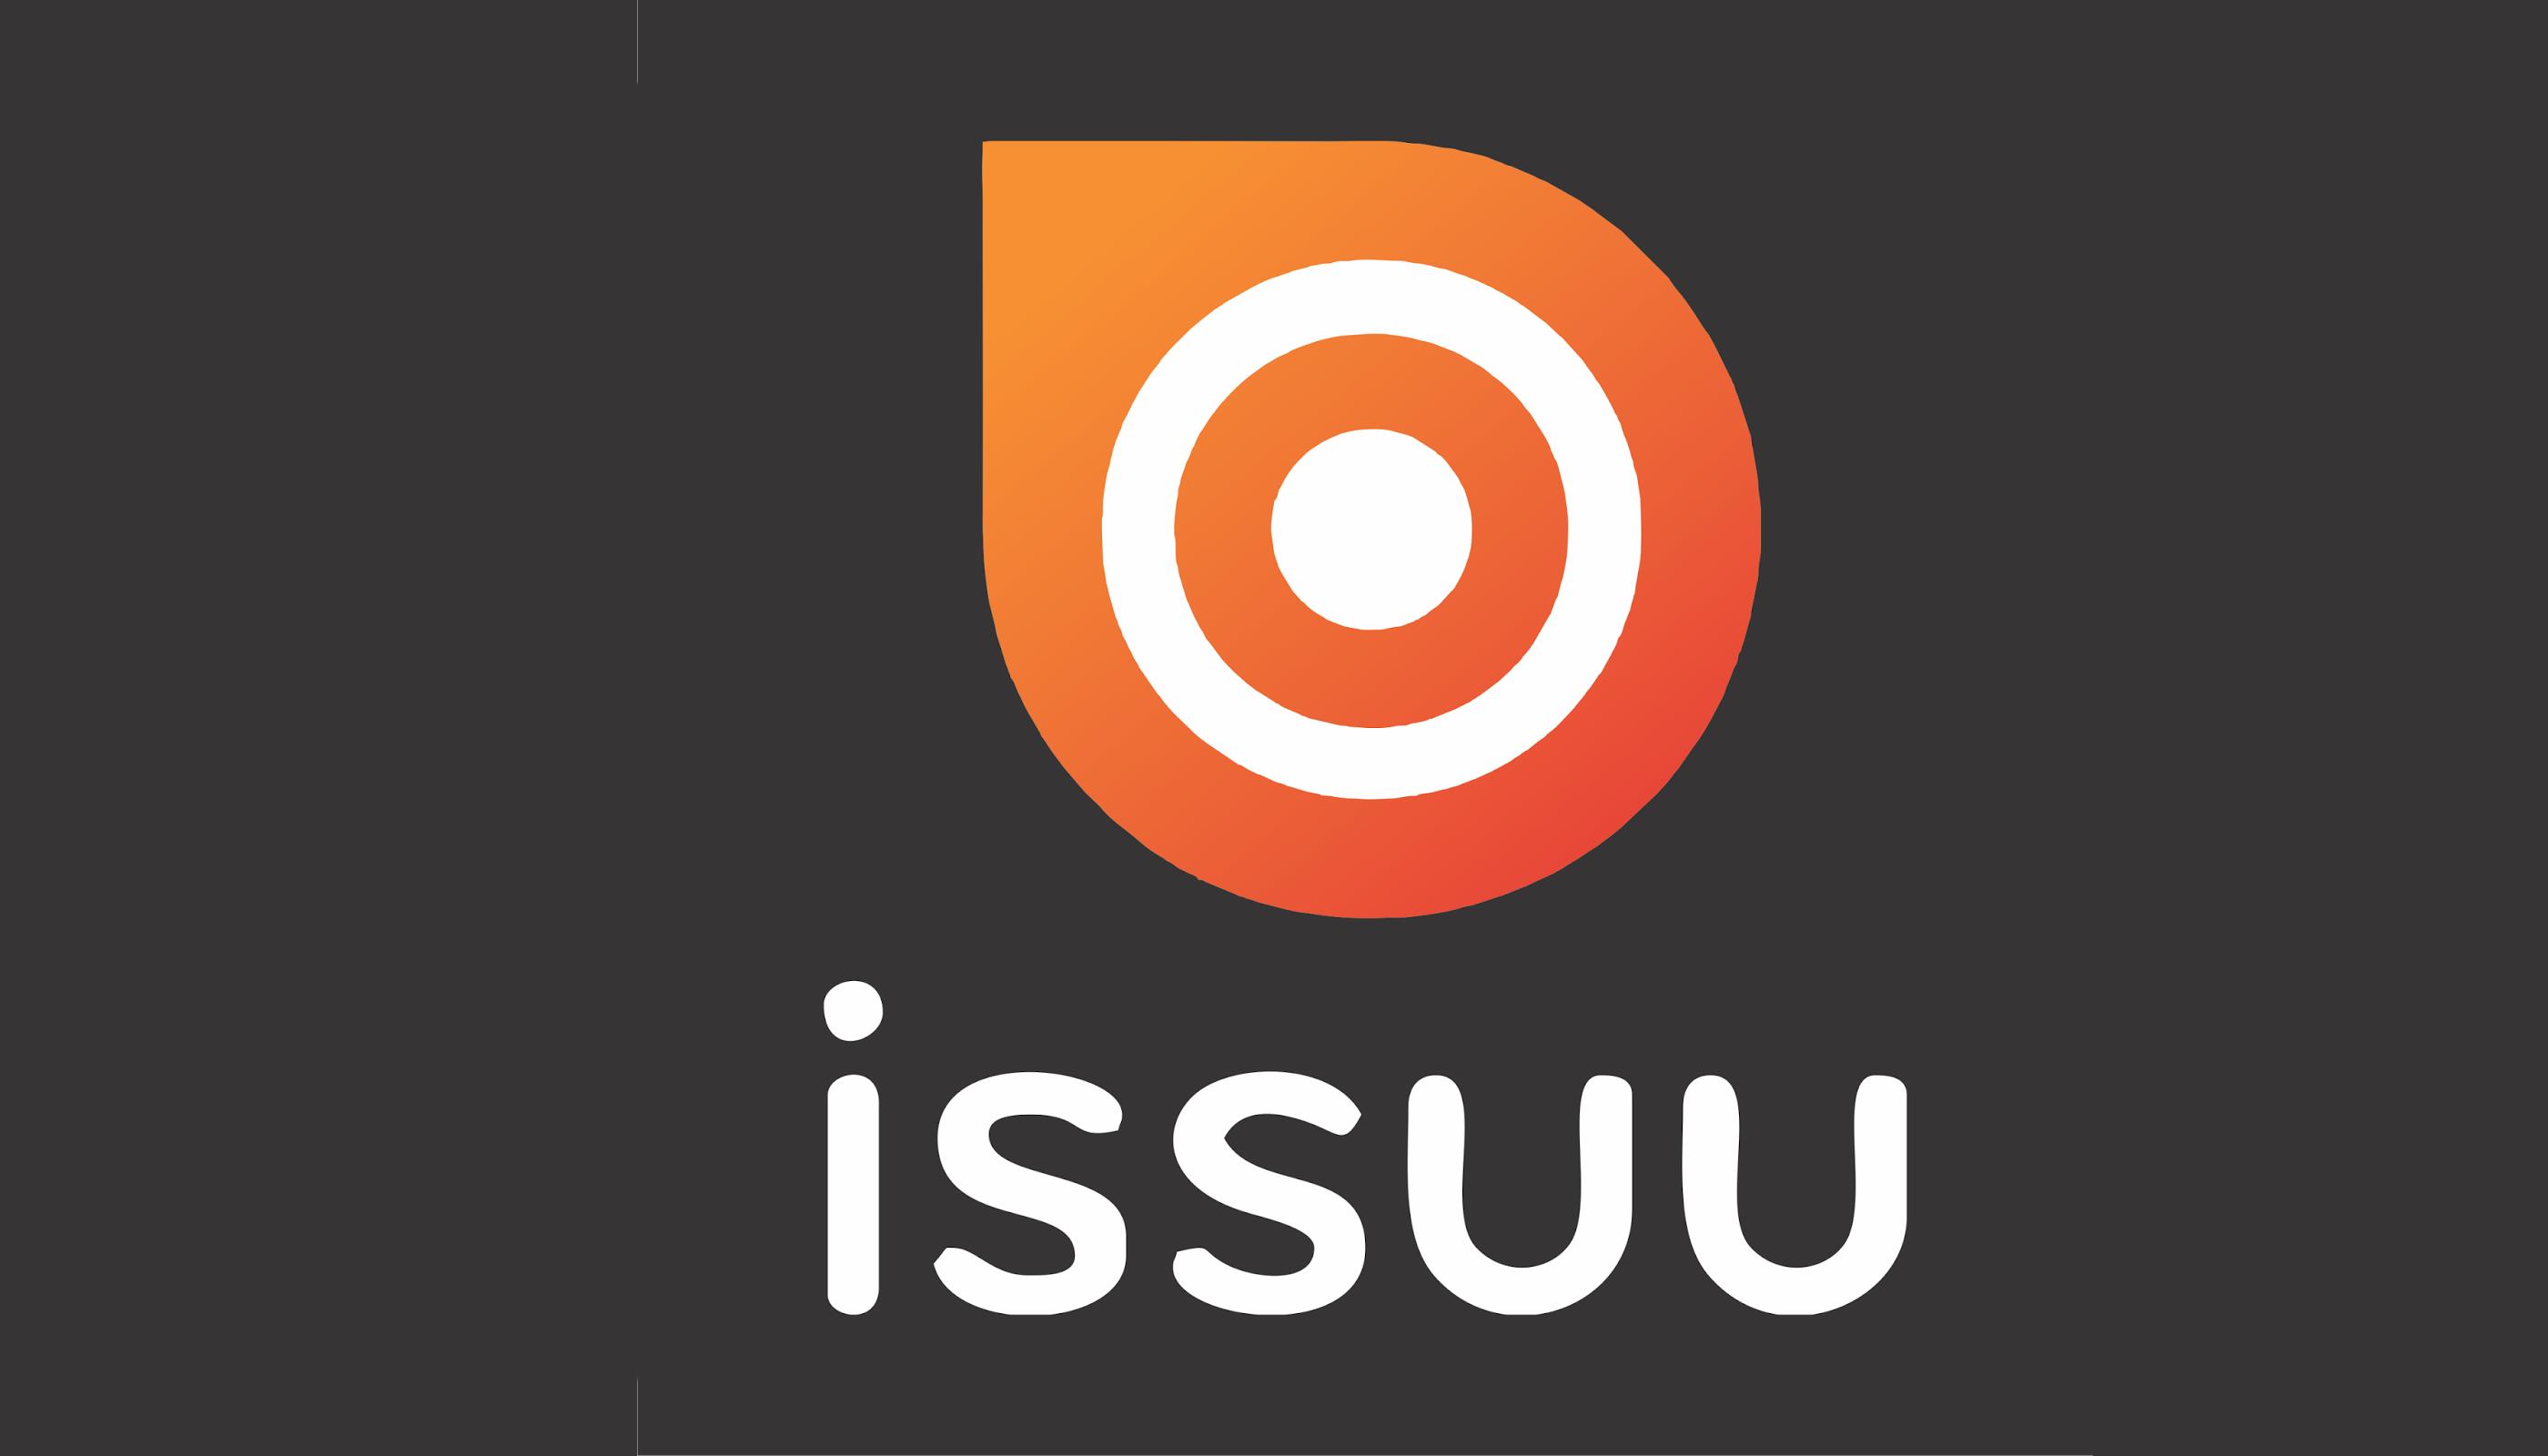 Issuu t'ajuda a compartir els teus documents a Internet Font: Issuu